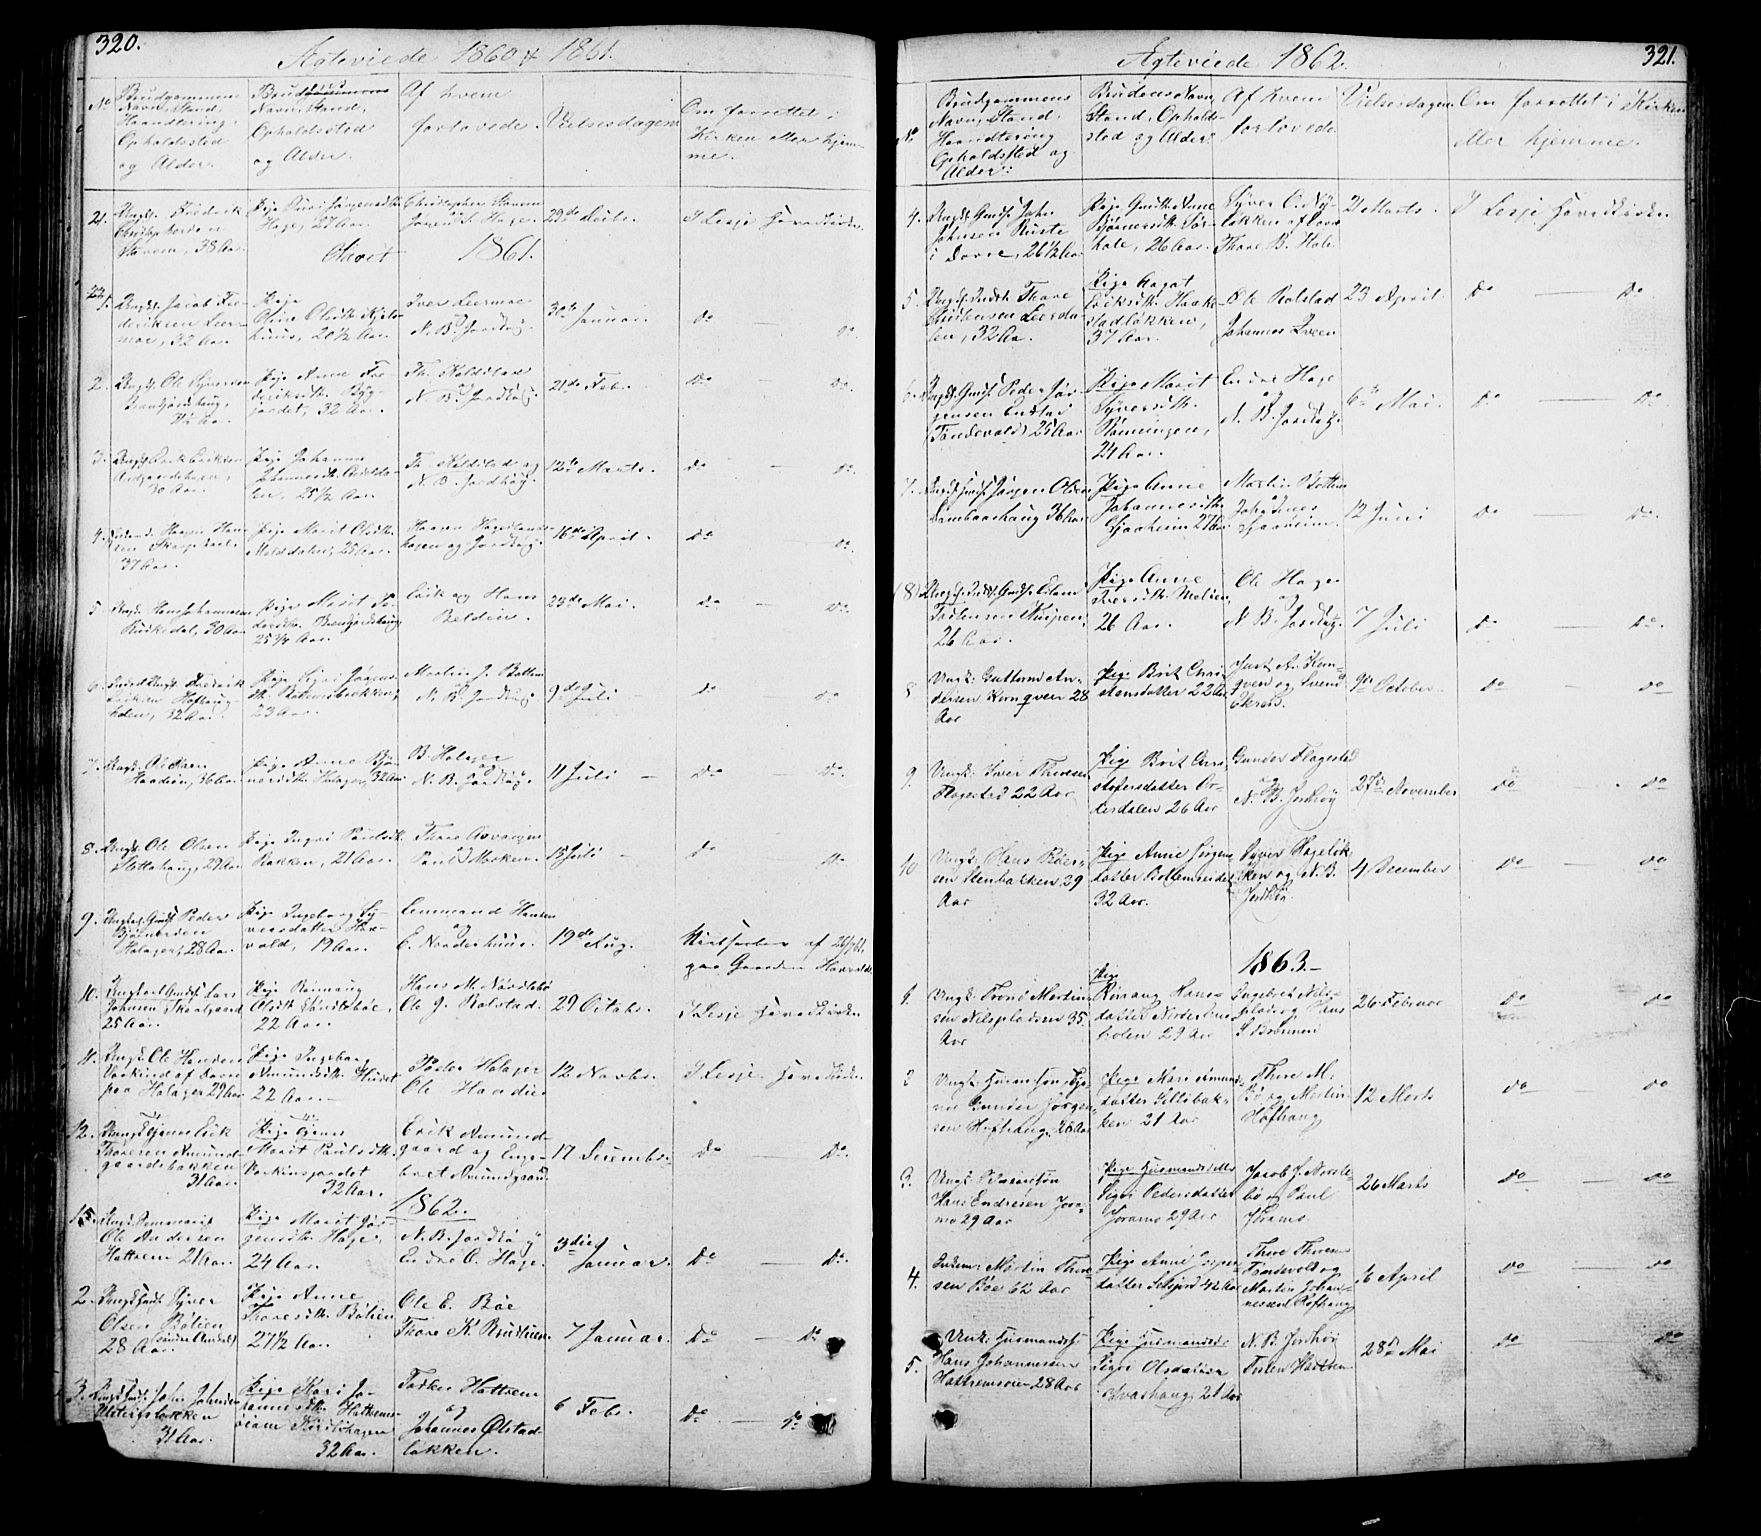 SAH, Lesja prestekontor, Klokkerbok nr. 5, 1850-1894, s. 320-321